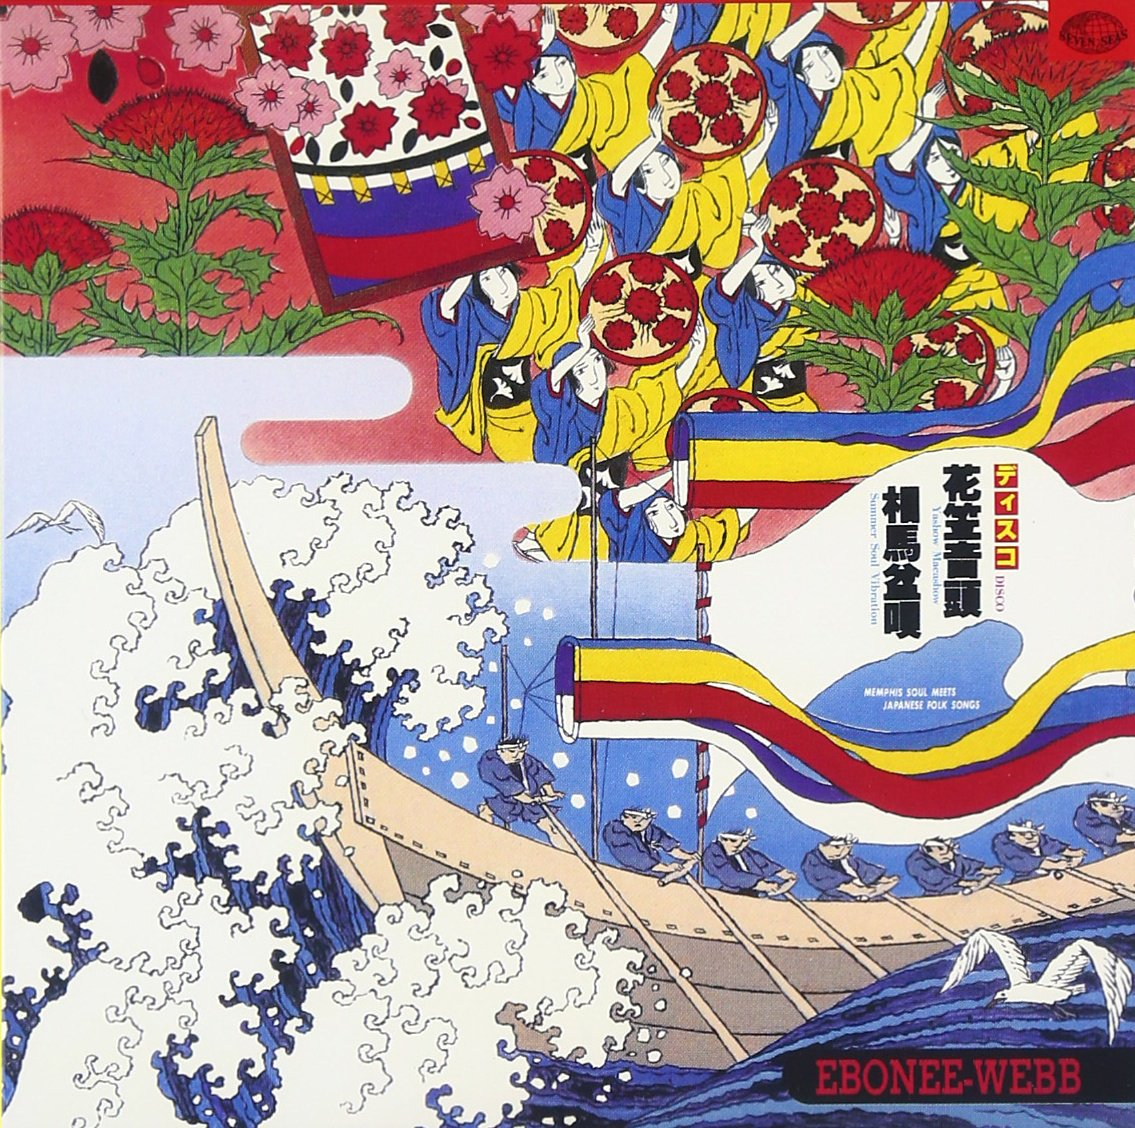 Memphis Soul Meets Japanese Folk Songs [Cardboard Sleeve (mini LP)] / Ebonee Webb